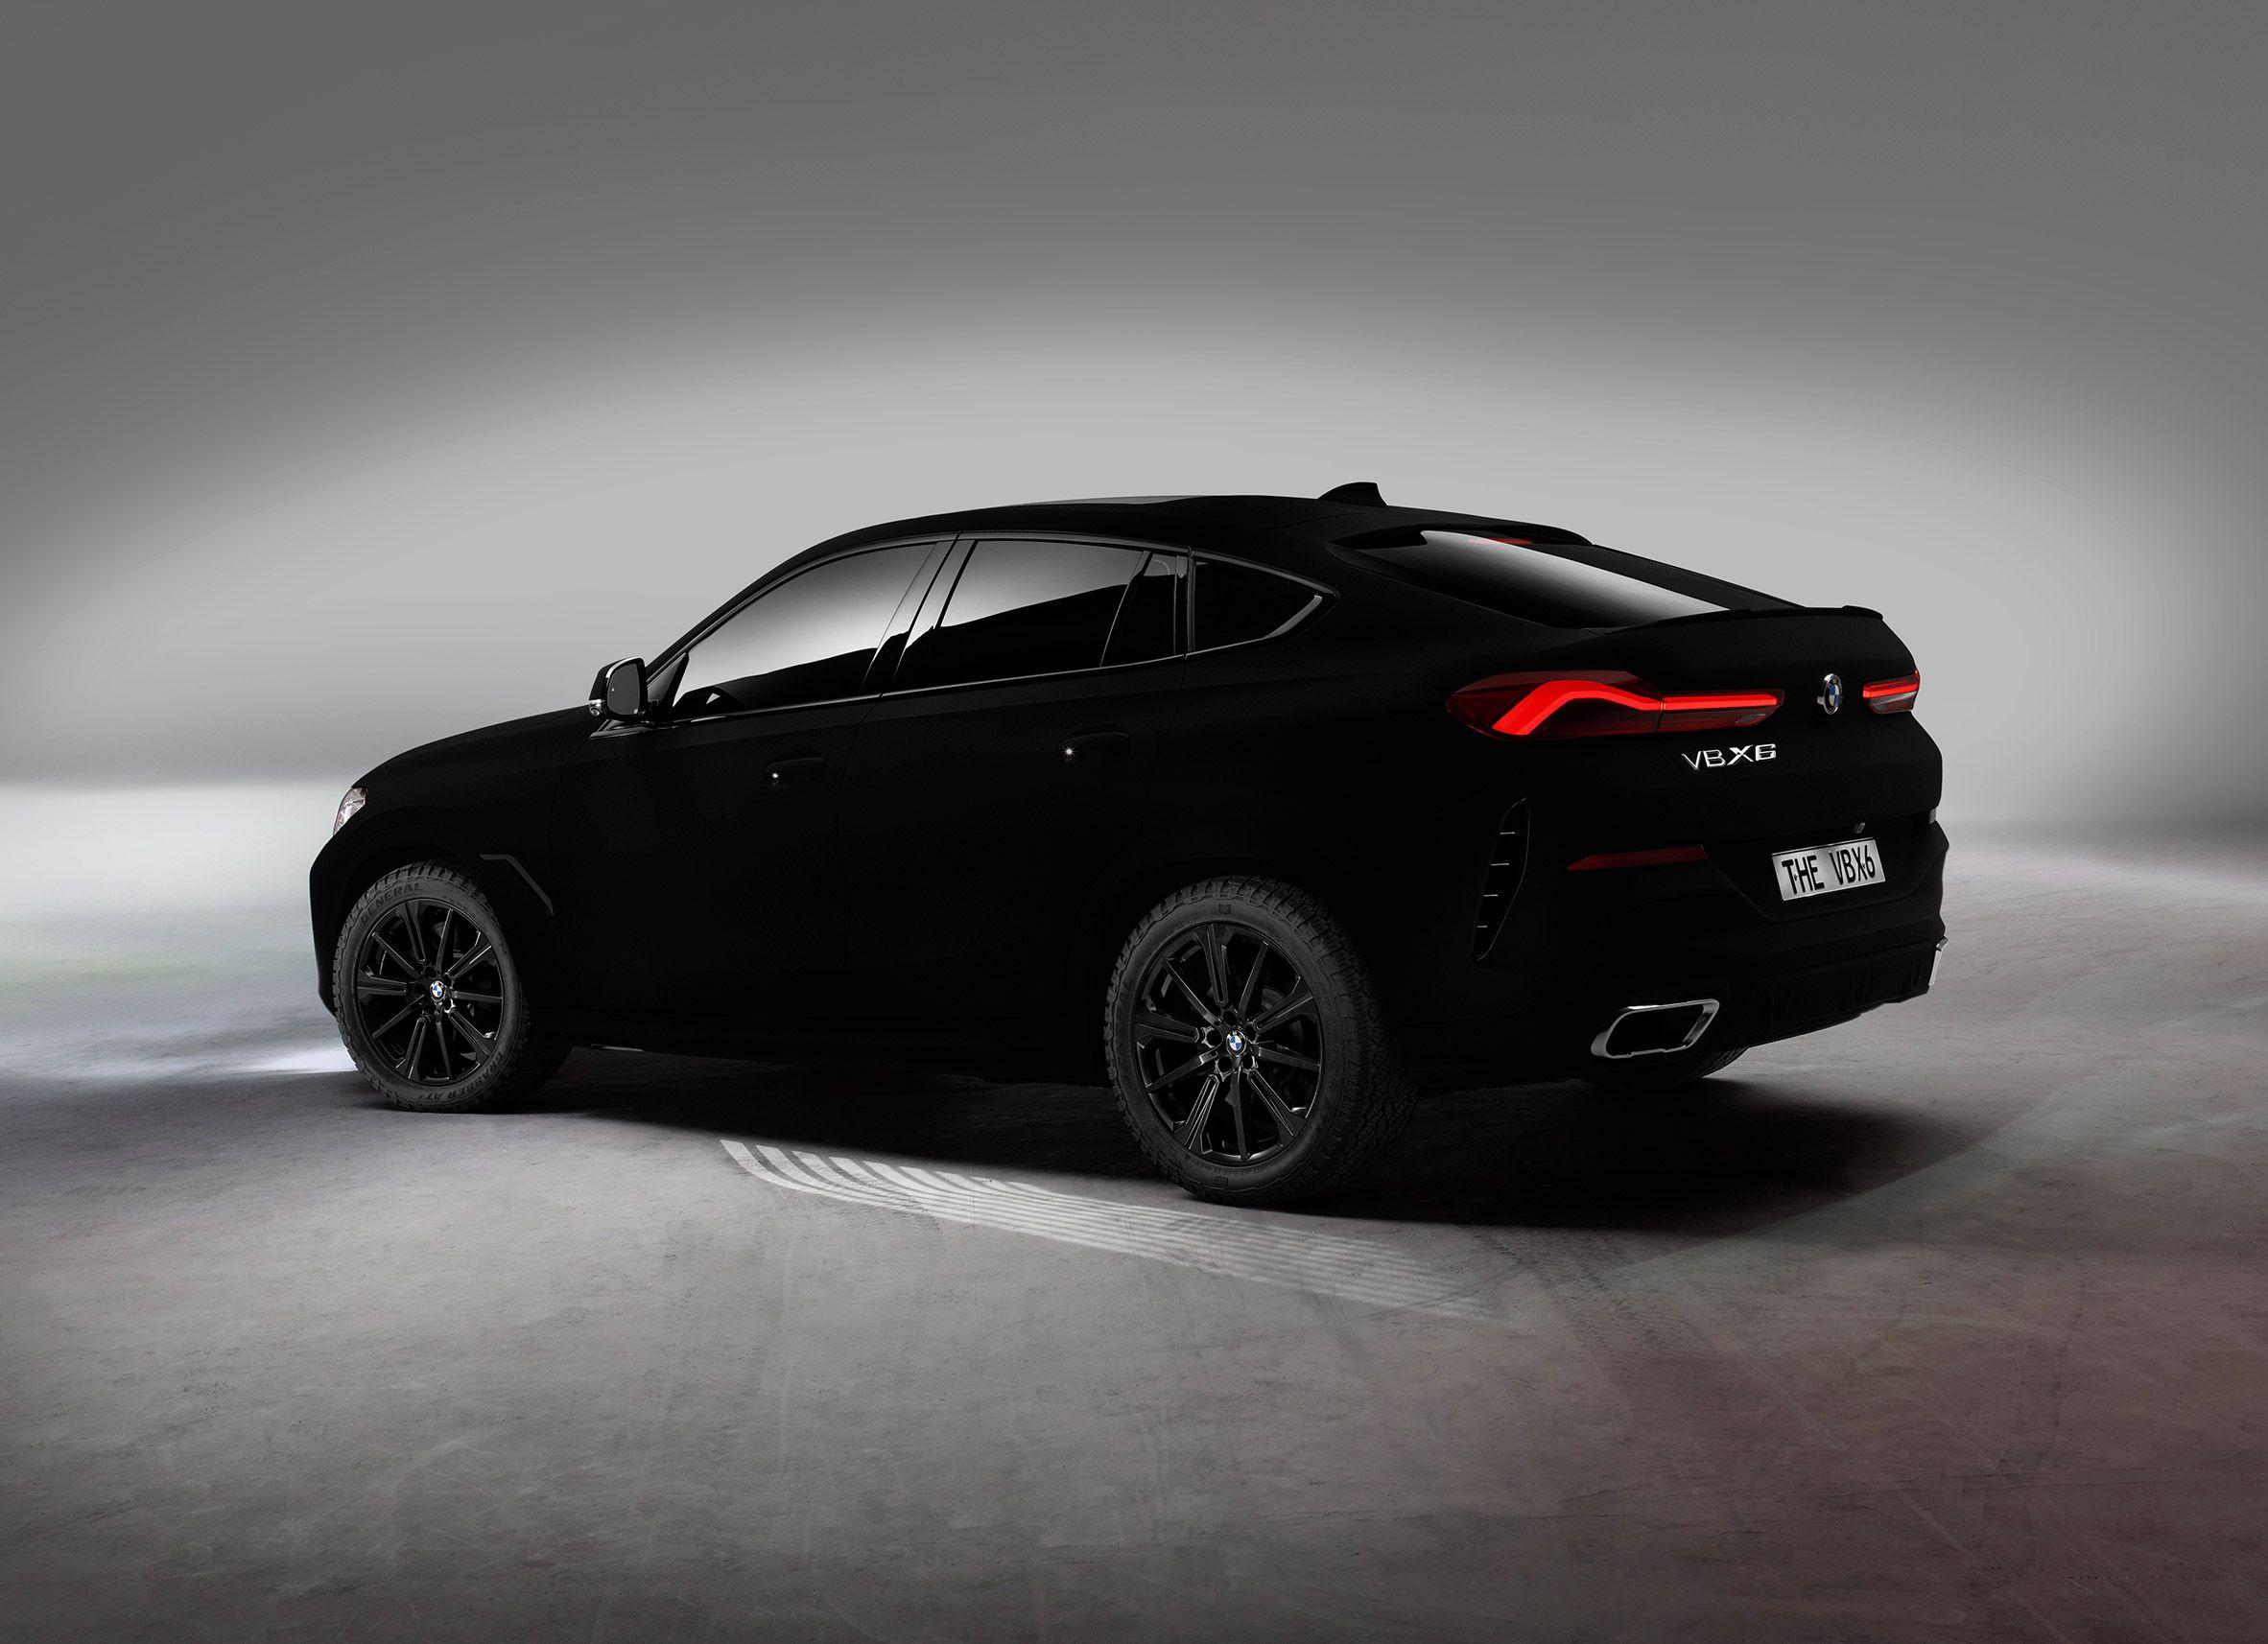 Bmw Unveils Blackest Black Bmw Vbx6 Car Sprayed With Vantablack